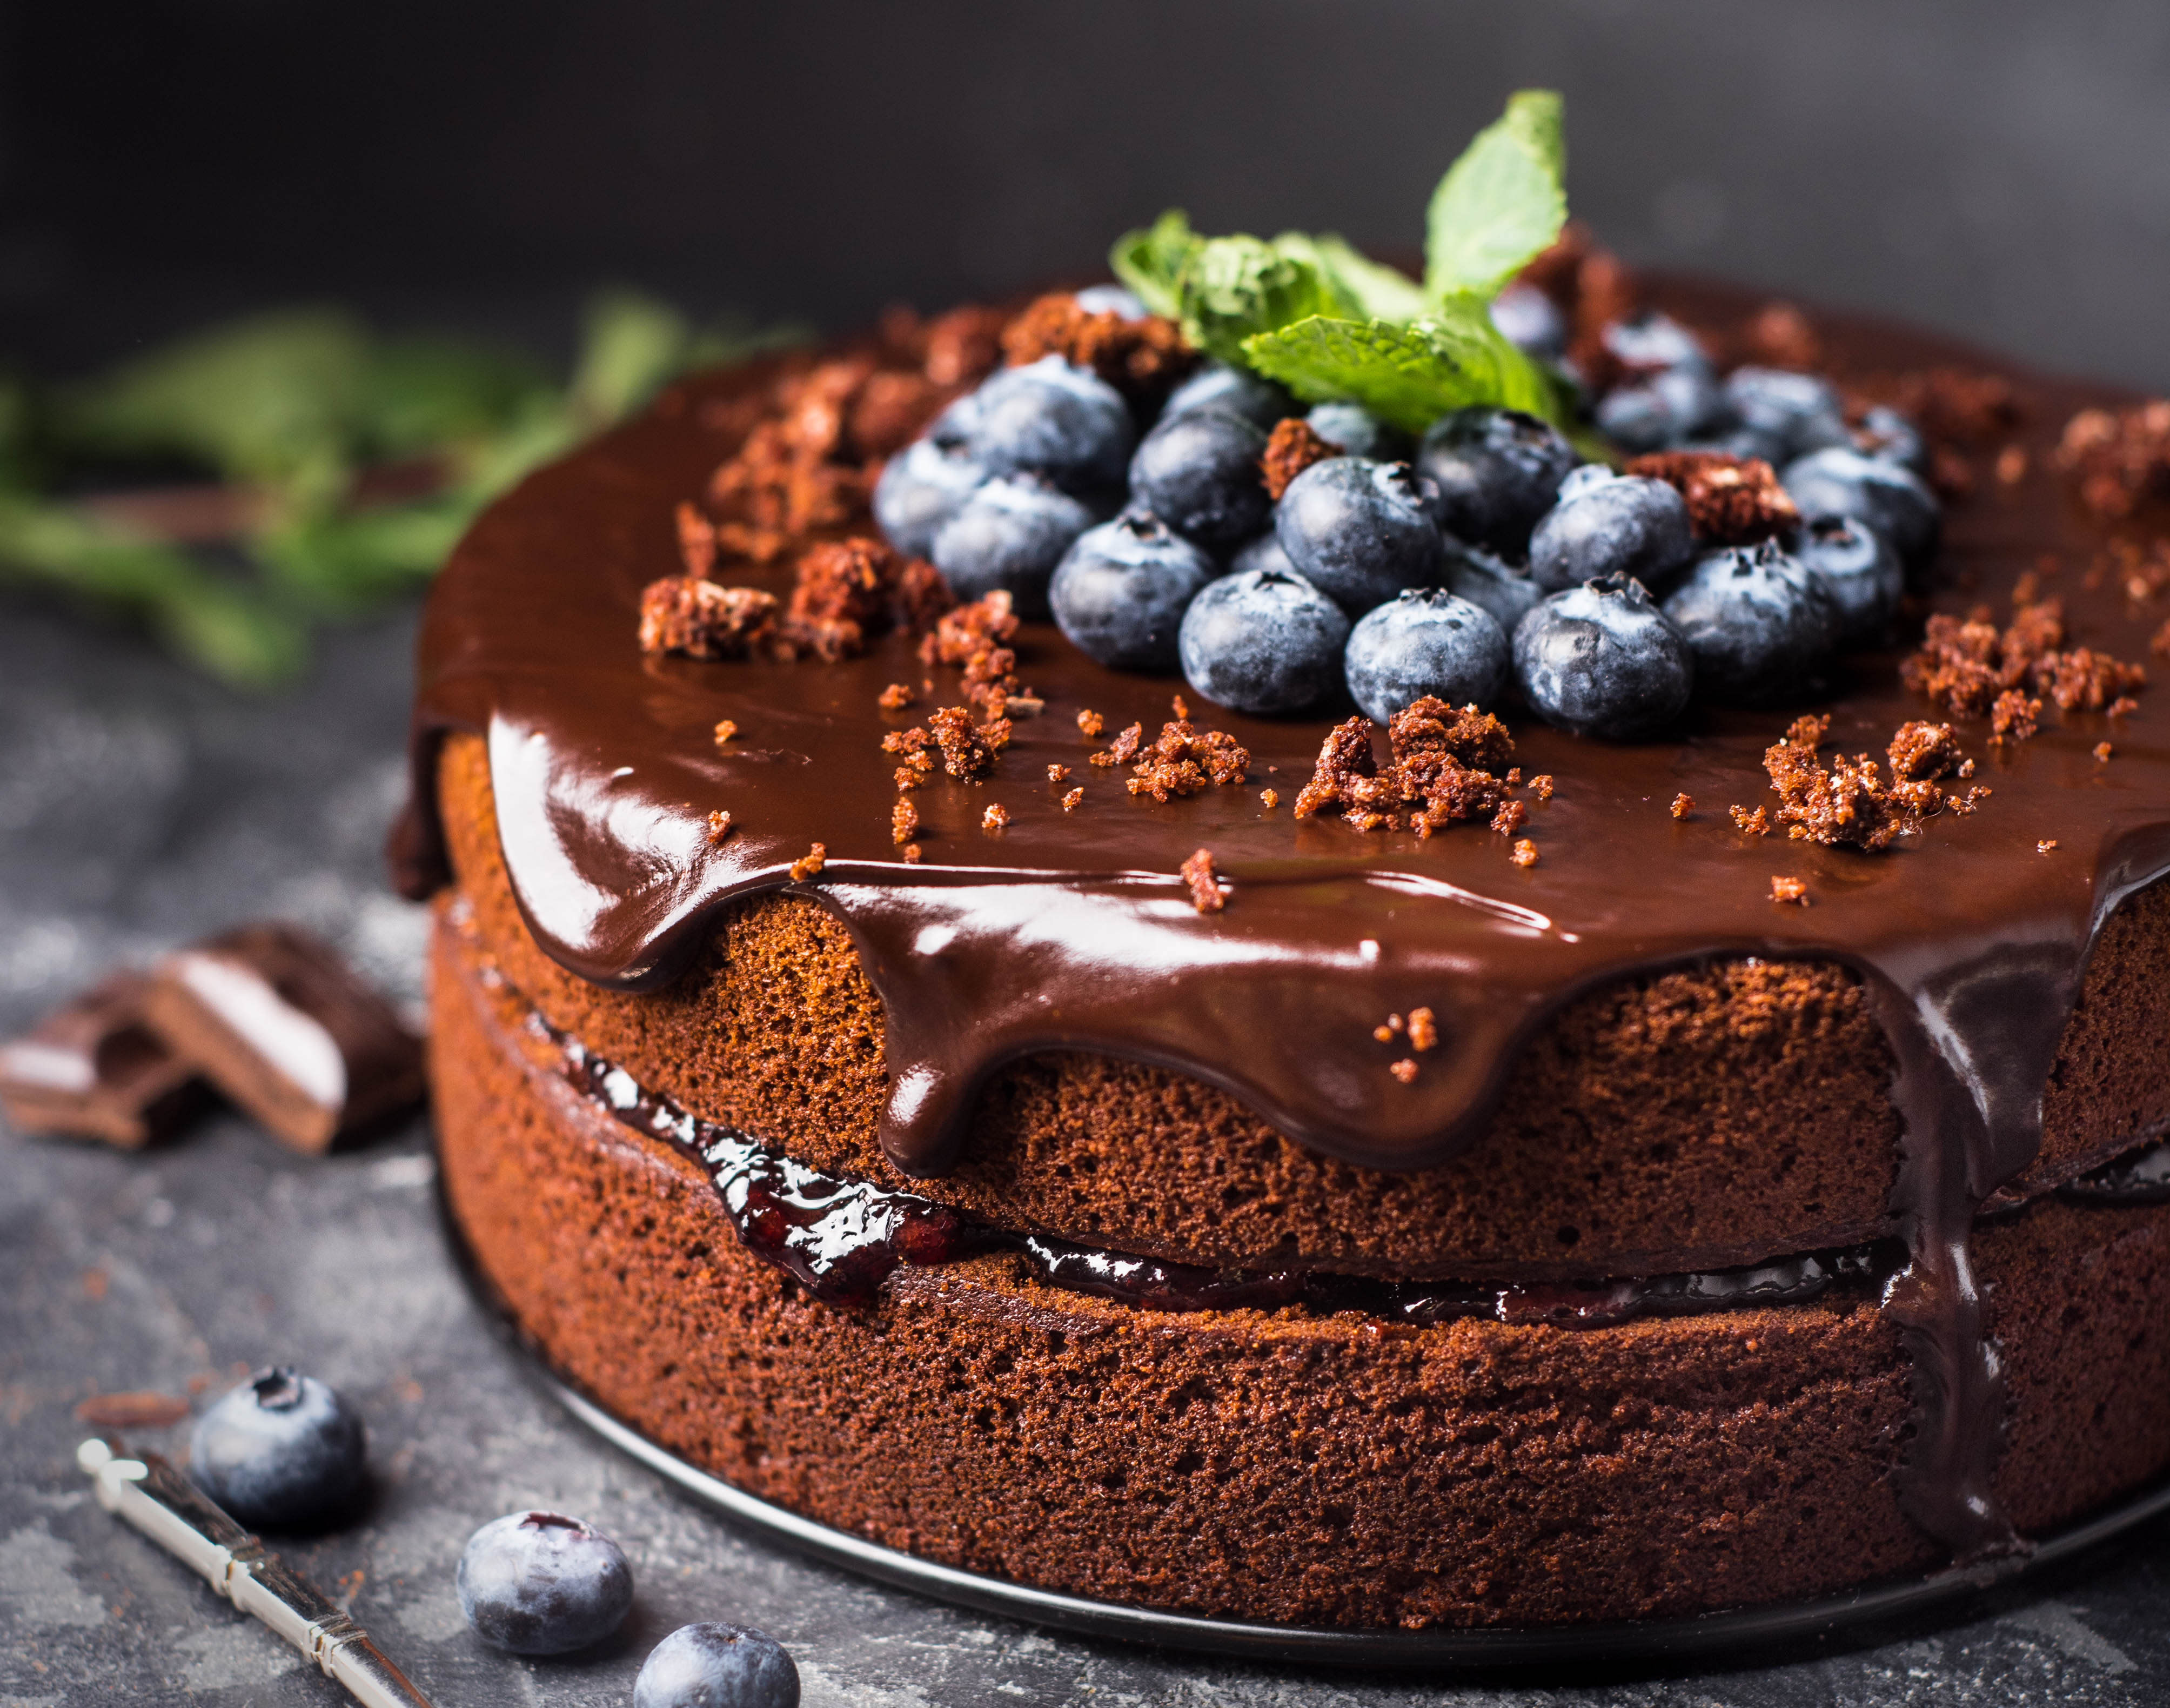 Star 1 Cakes